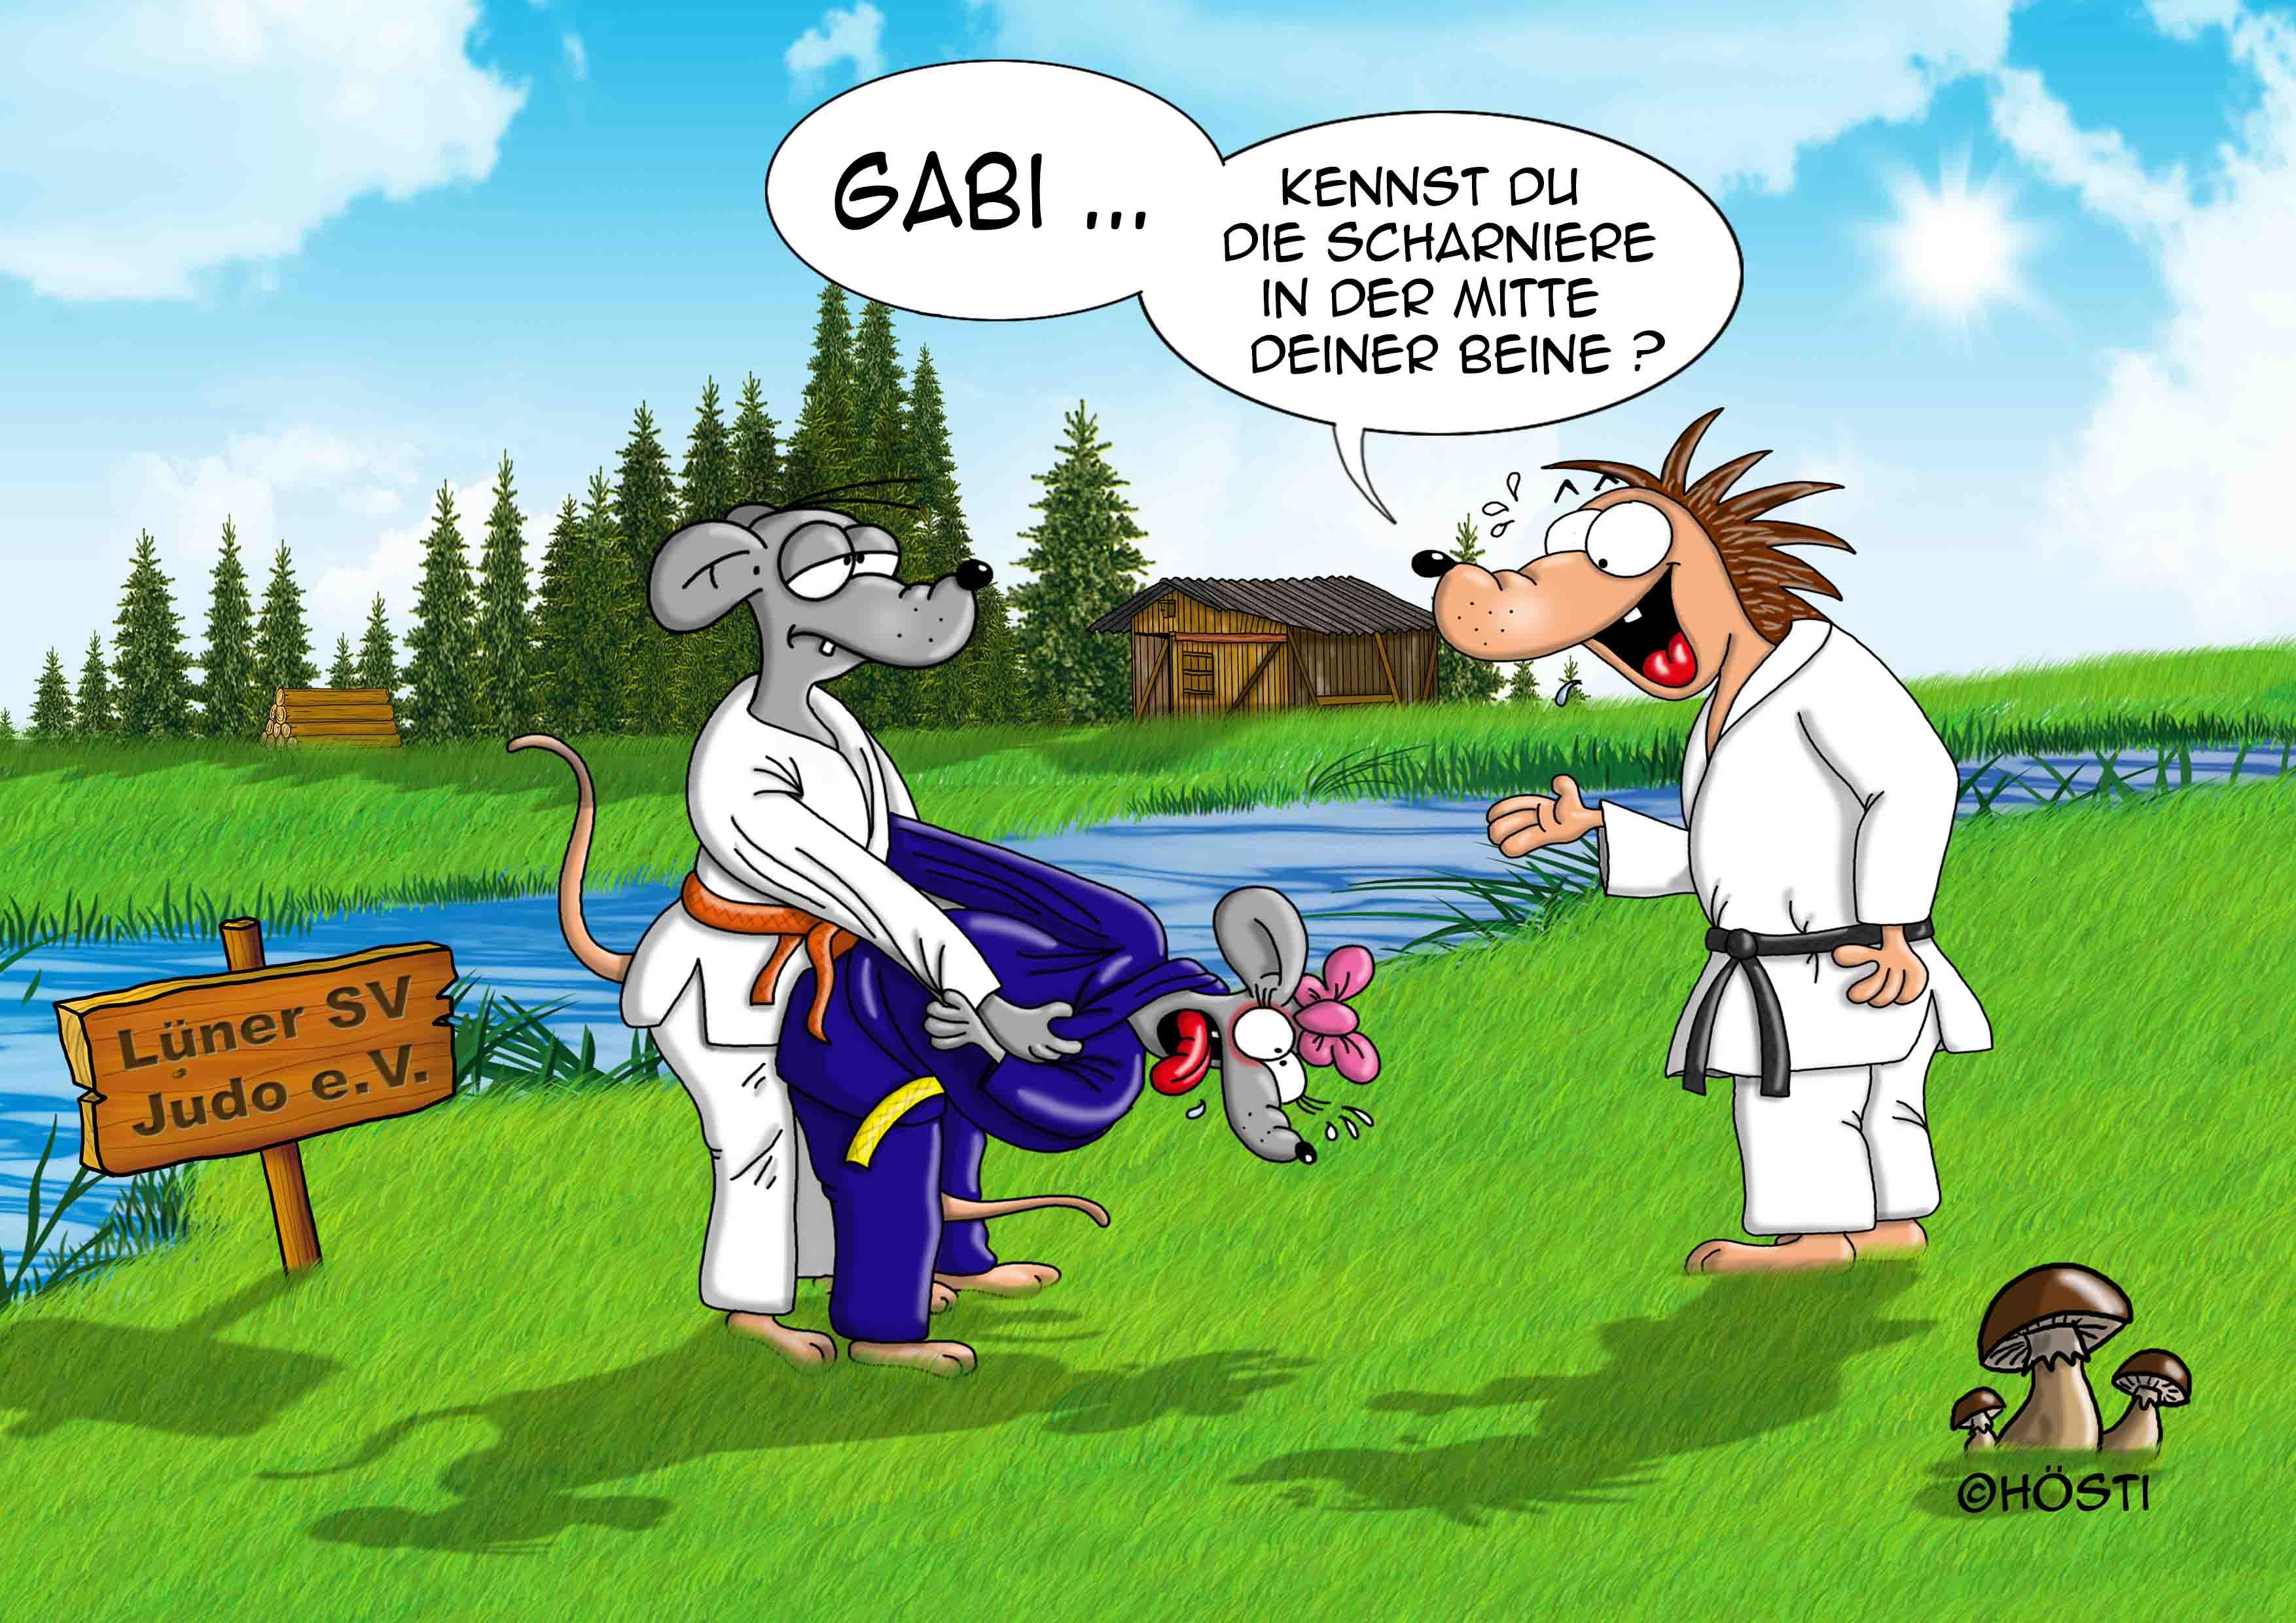 judoka gabi